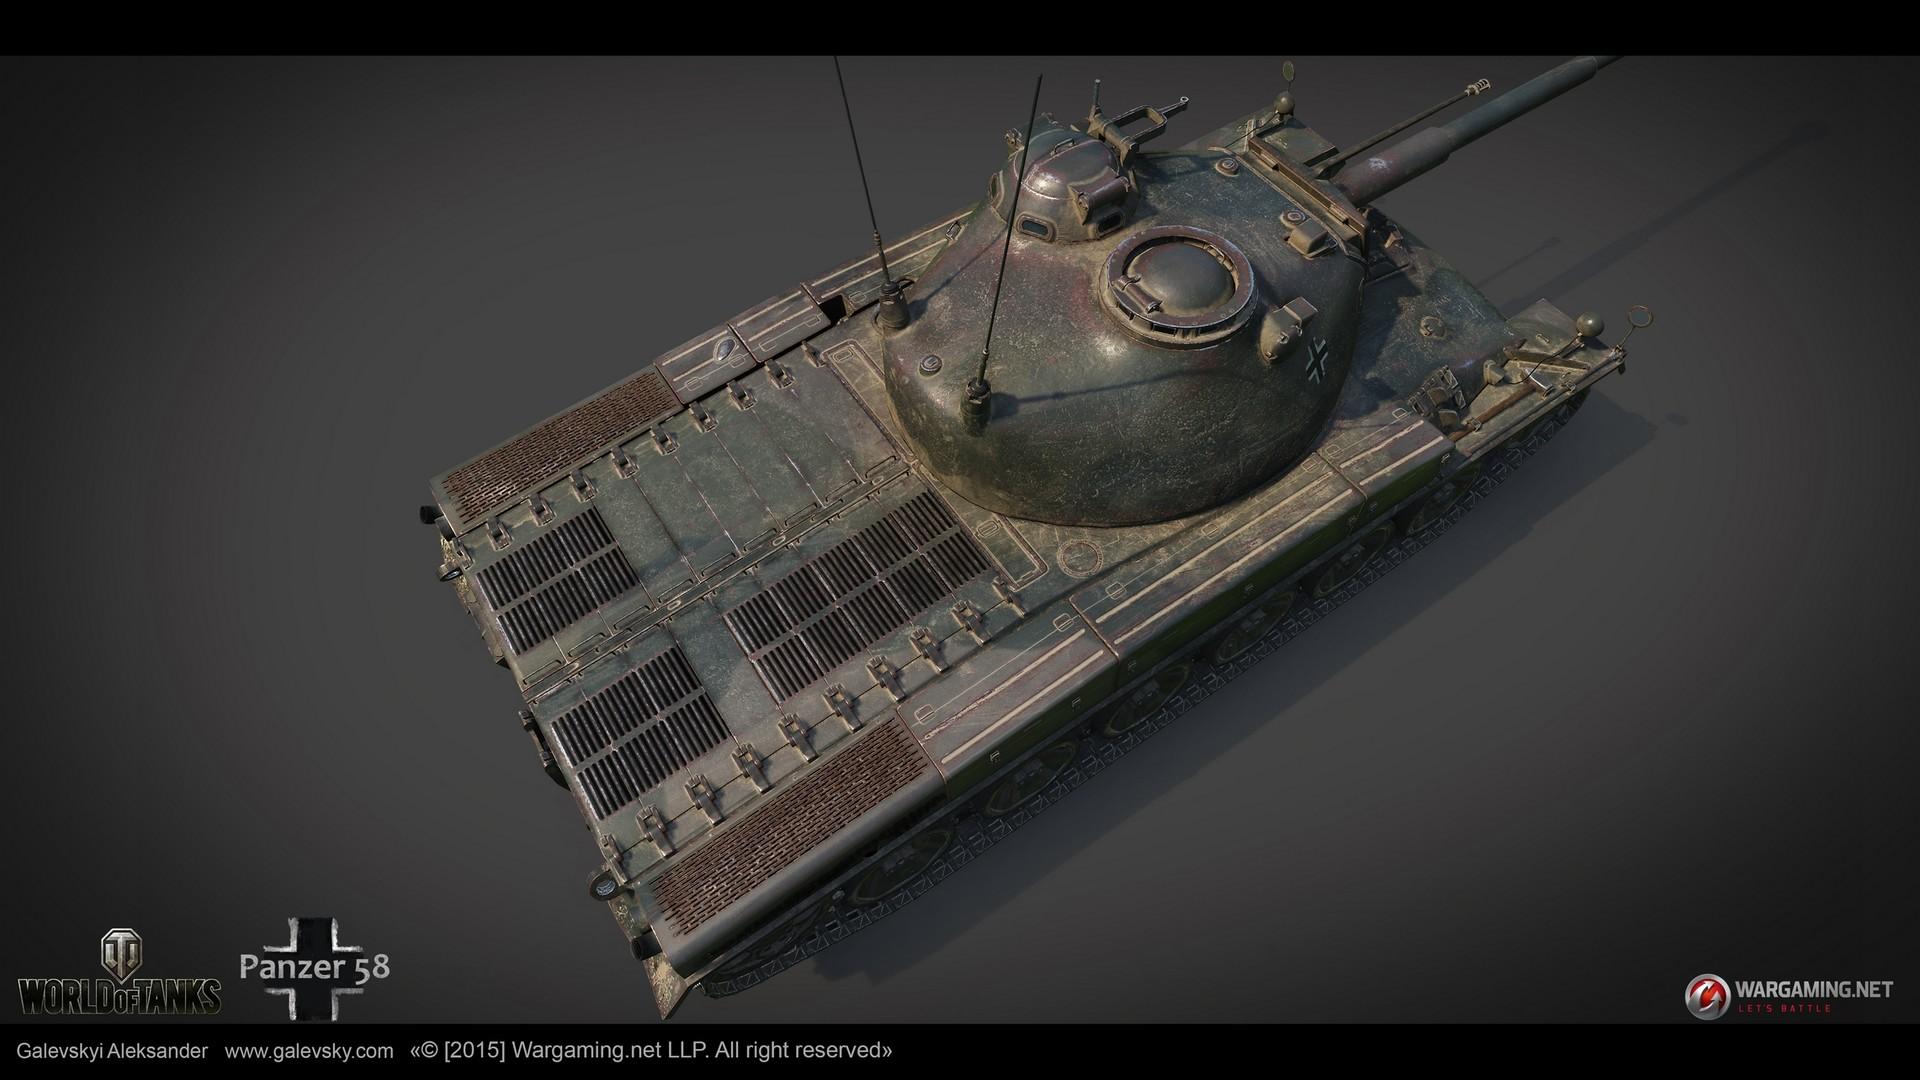 Aleksander galevskyi panzer 58 09 med